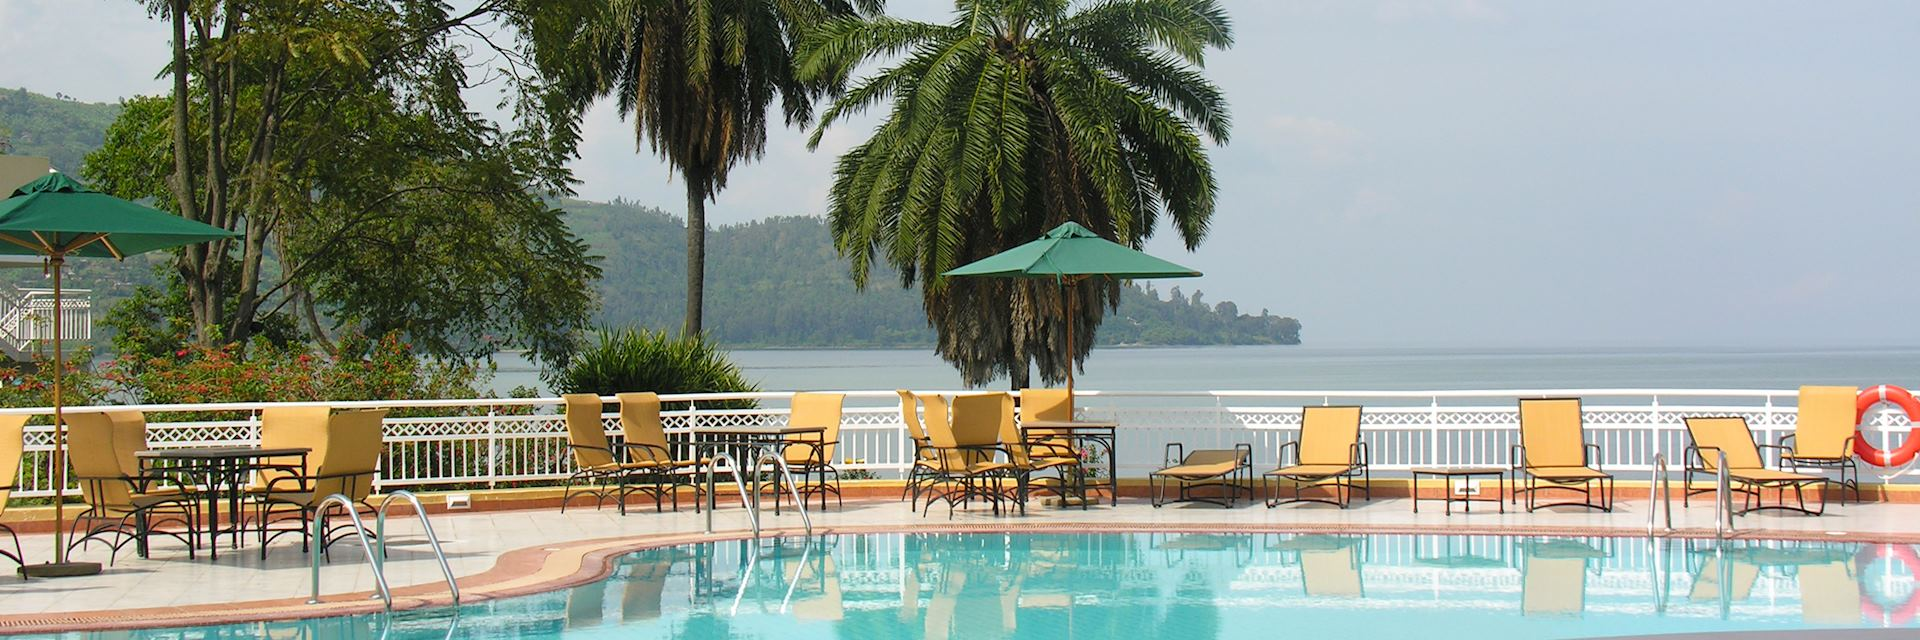 Lake Kivu Serena, Rwanda